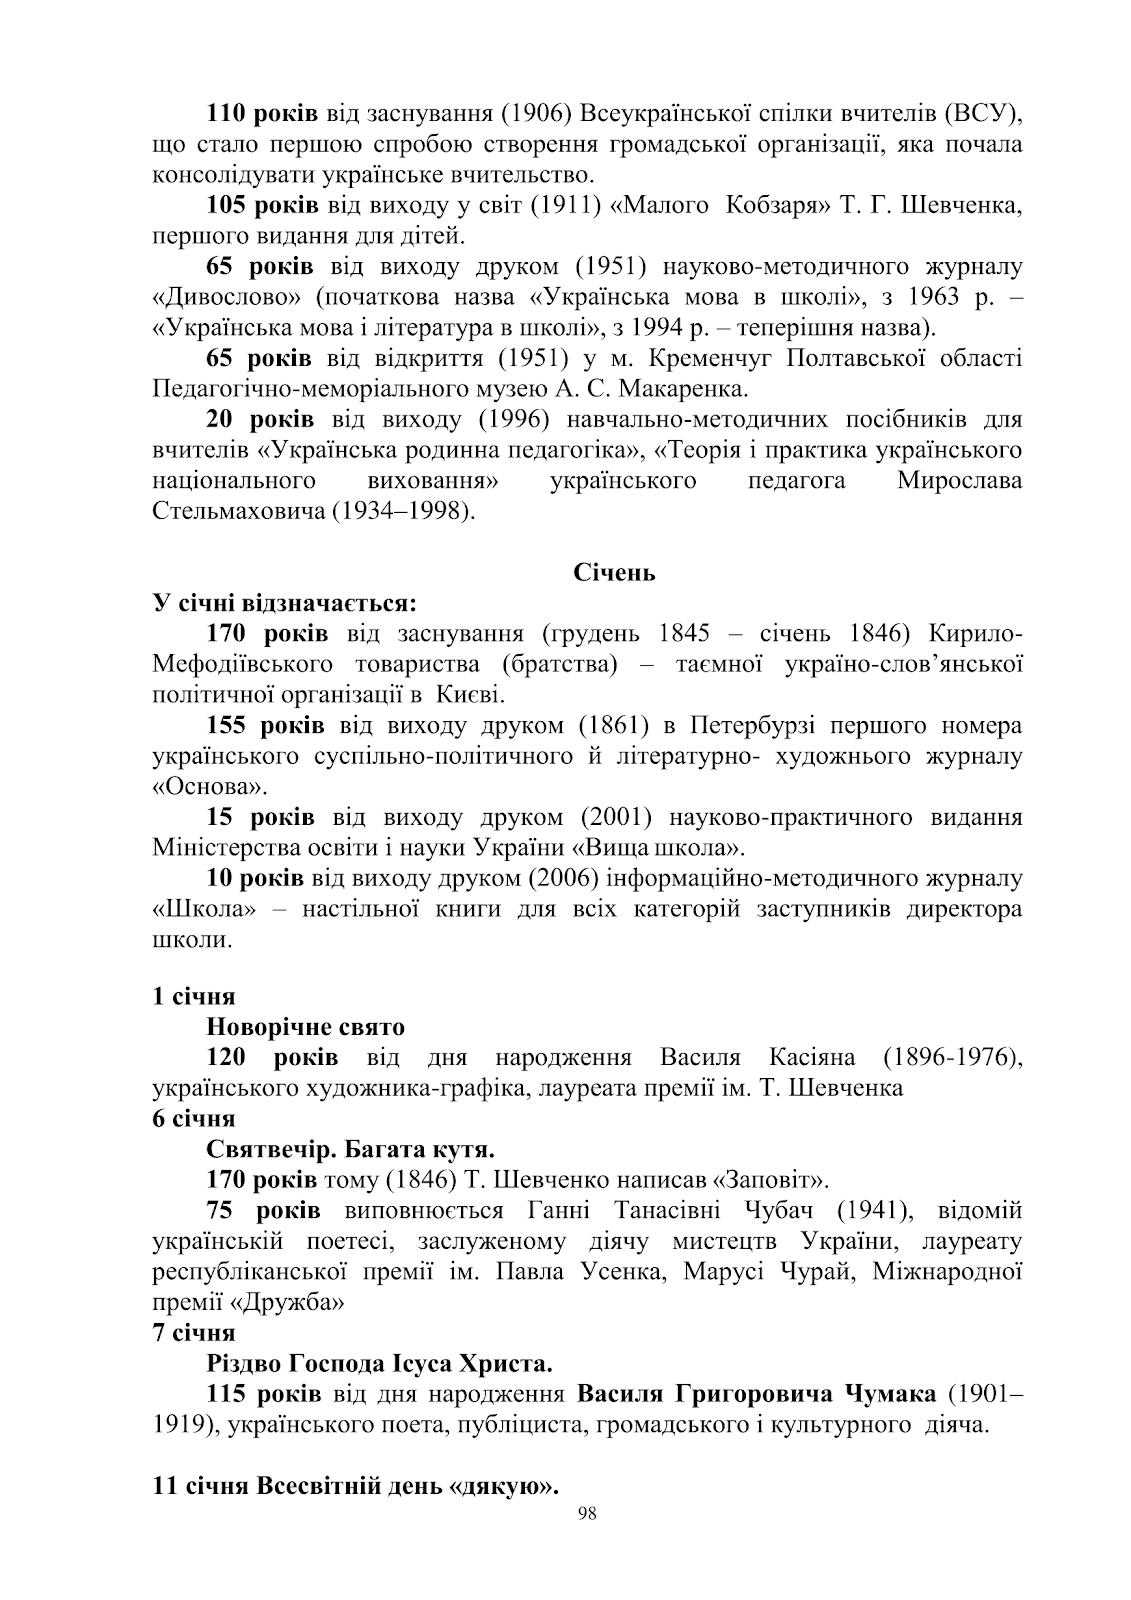 C:\Users\Валерия\Desktop\план 2016 рік\план 2016 рік-098.png